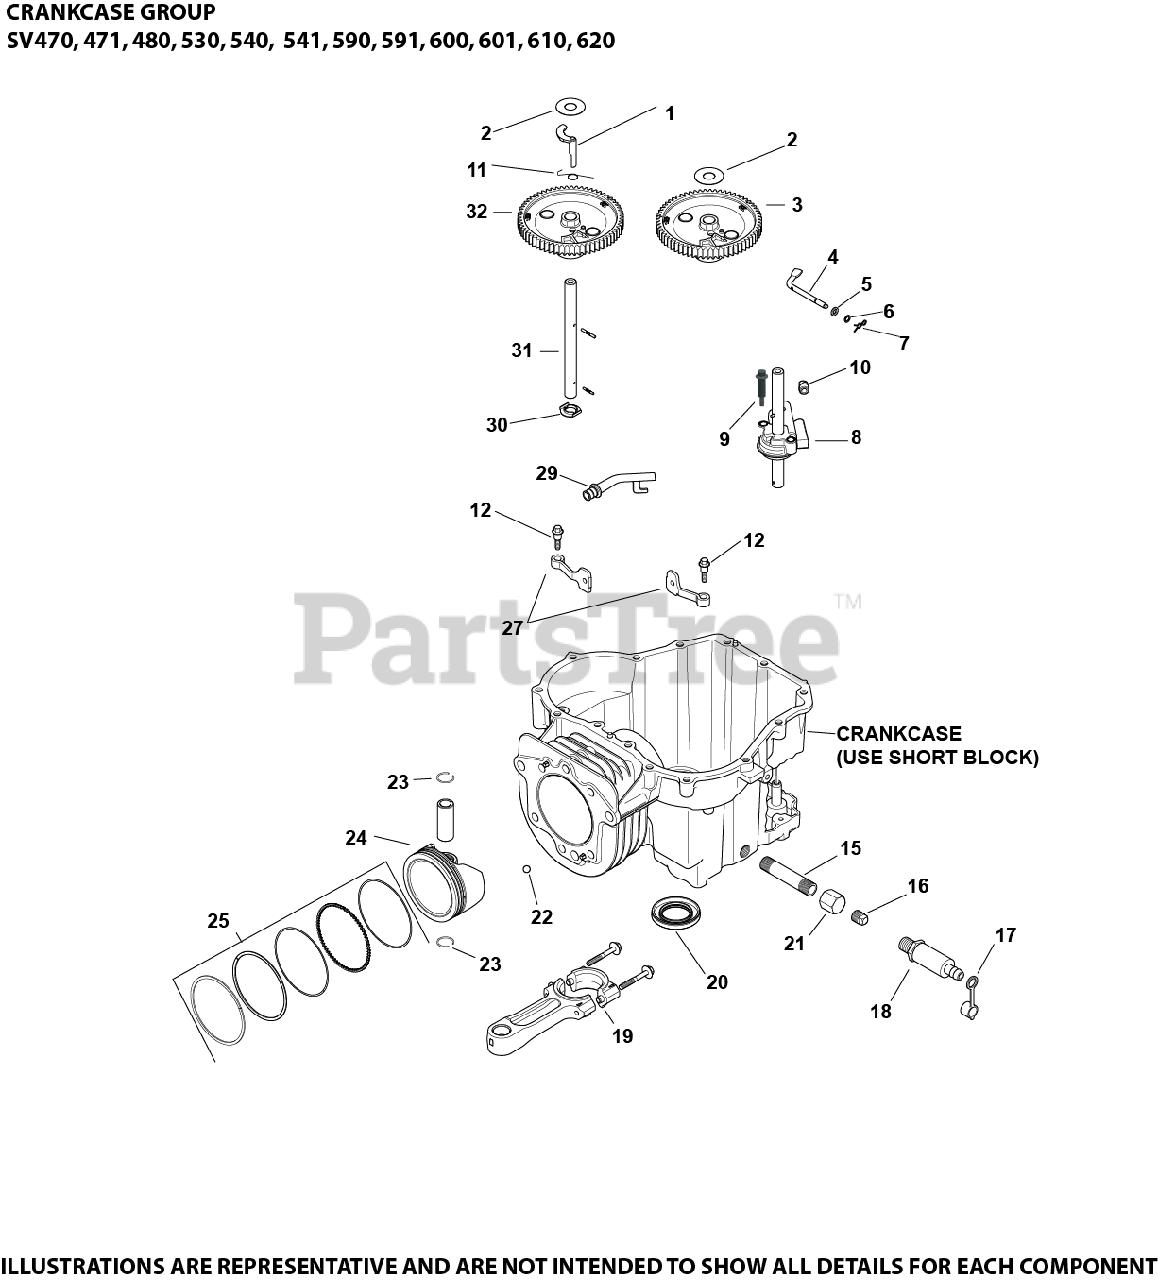 Kohler Parts on the Crankcase Group 2-20-22 SV470-620